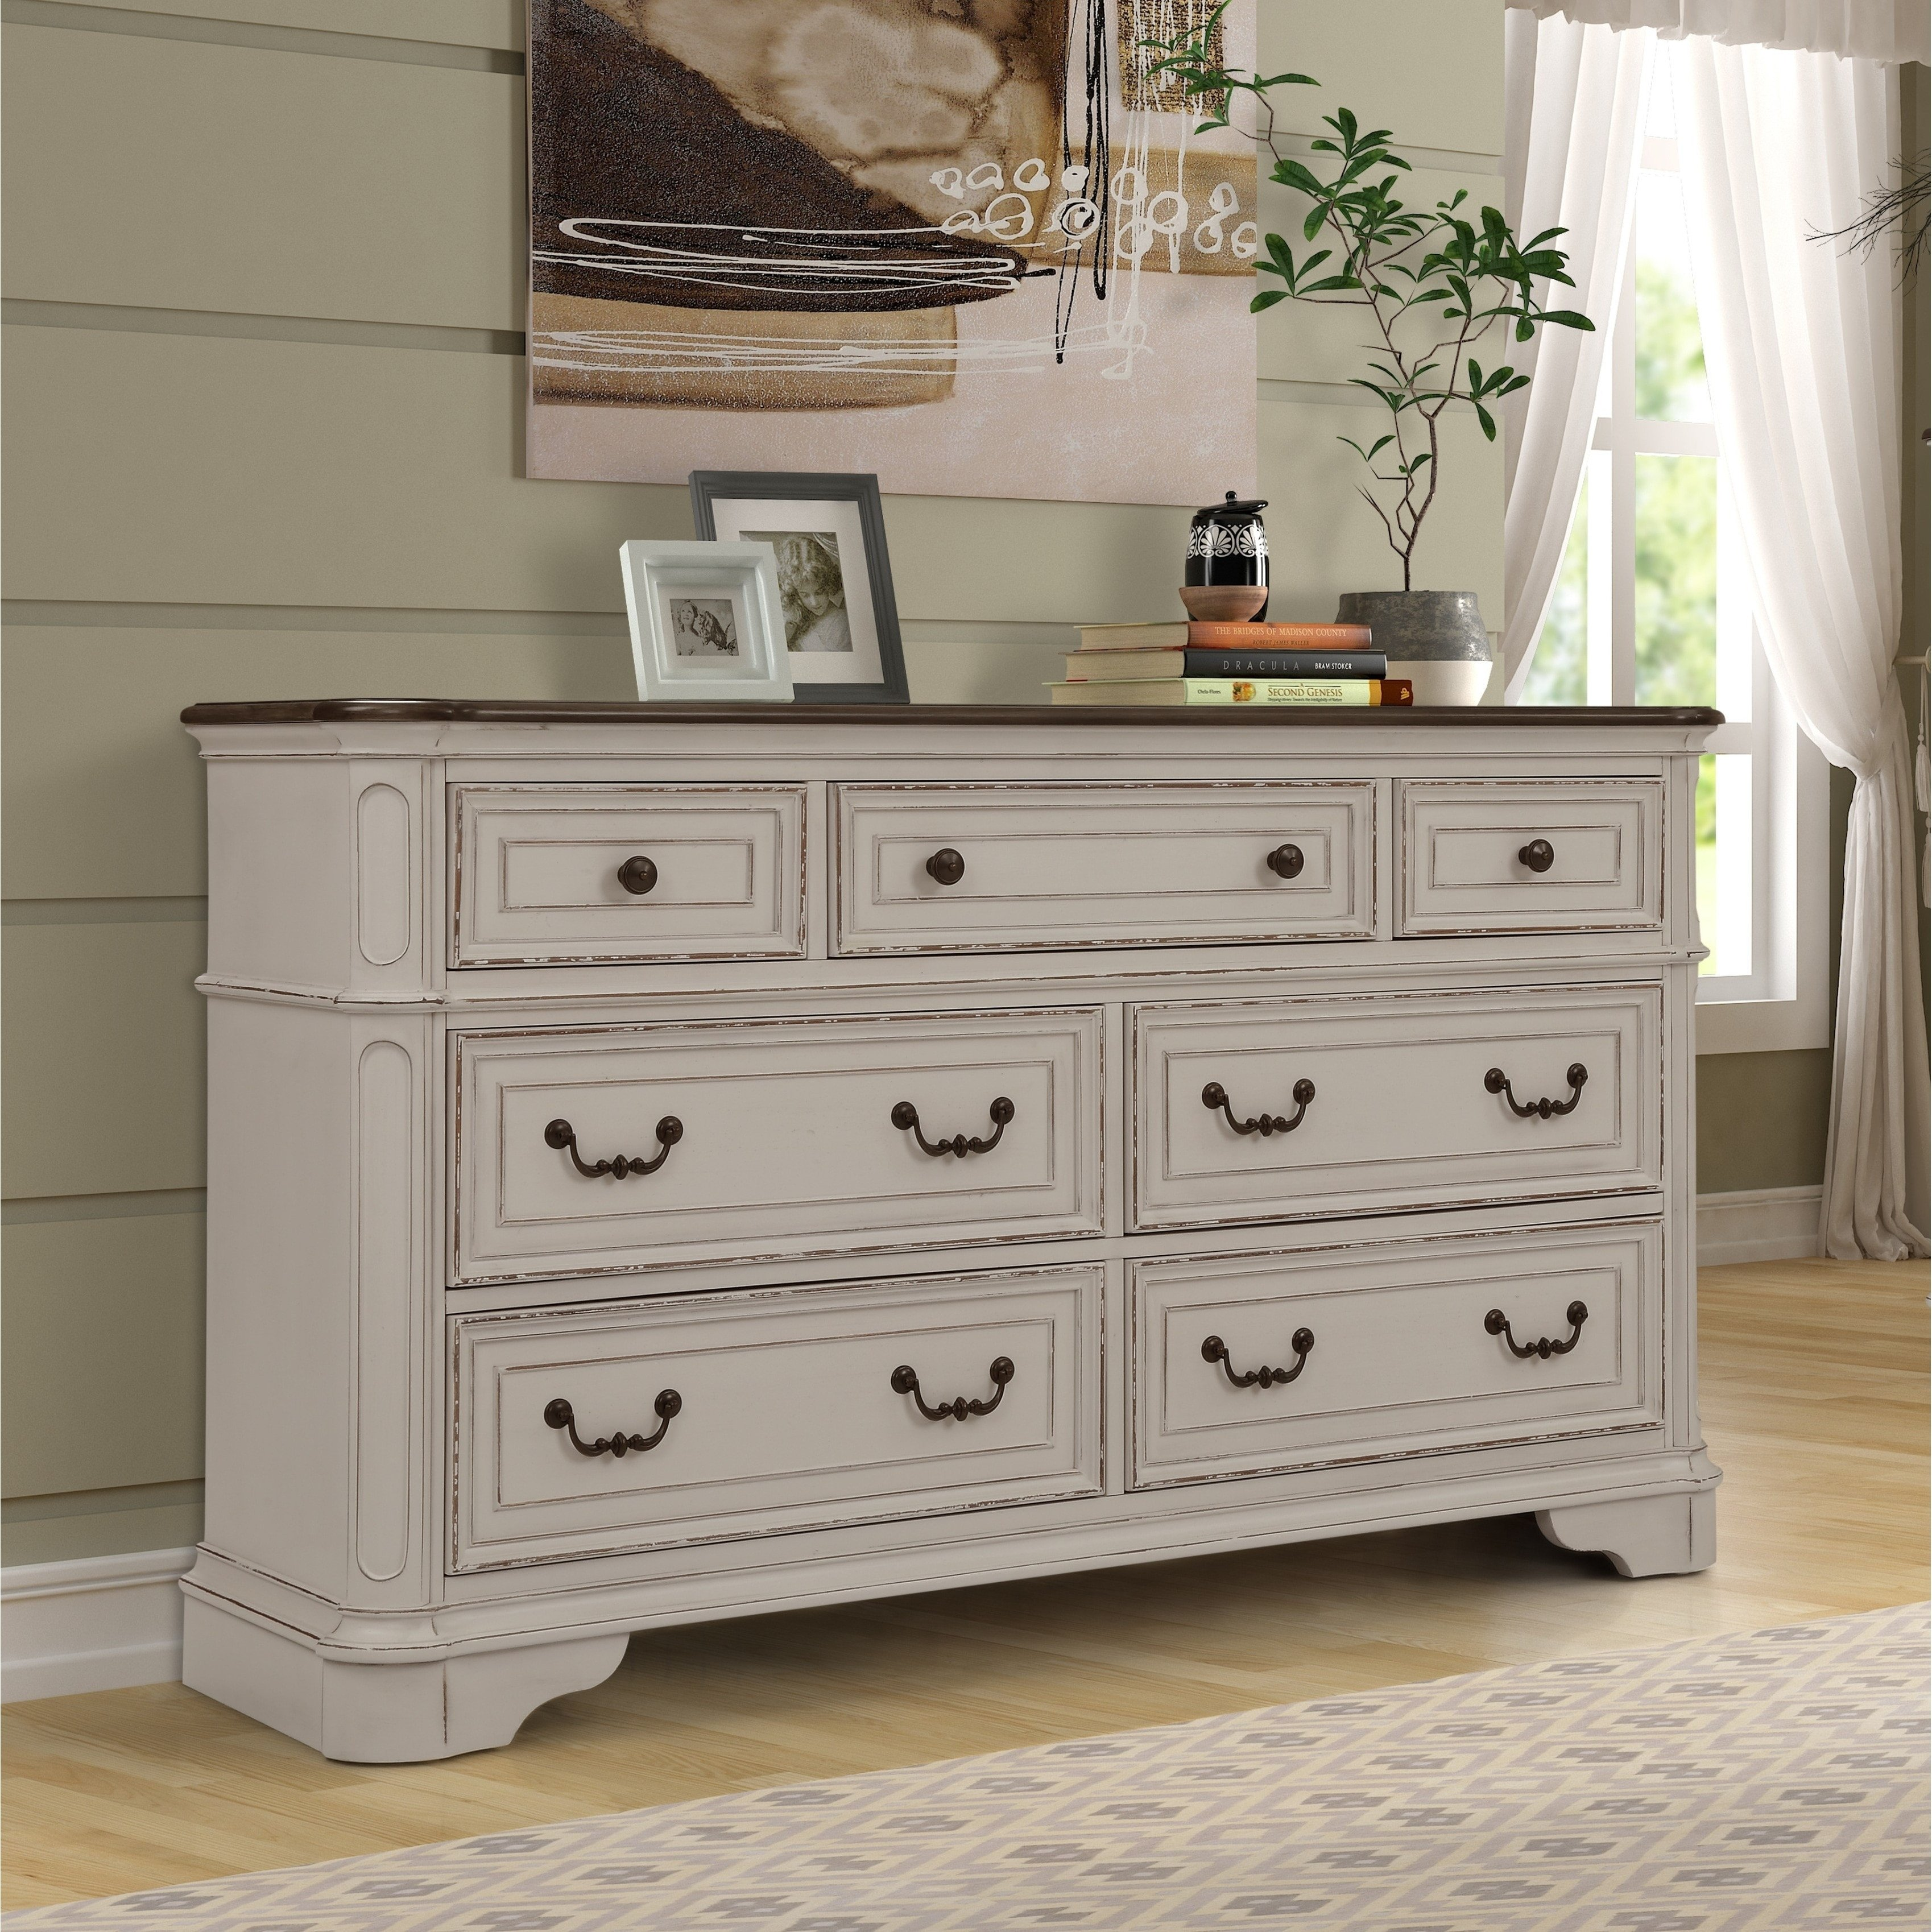 Cheap Bedroom Dresser Set Best Of the Gray Barn Ariana Hills Antique White and Oak Wood Dresser